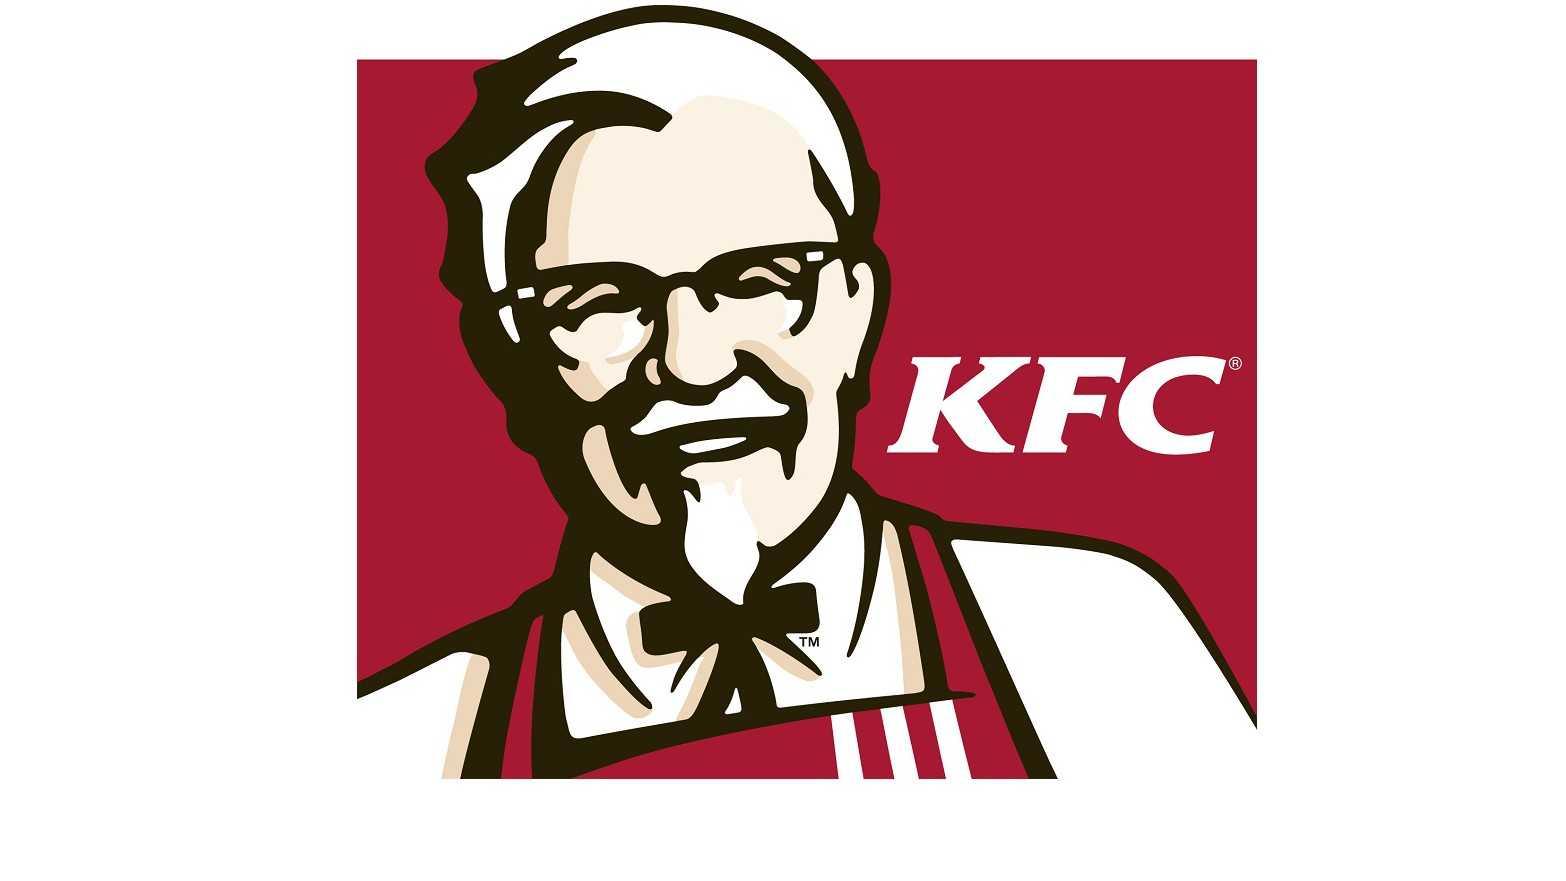 Nice - KFC Jean Médecin